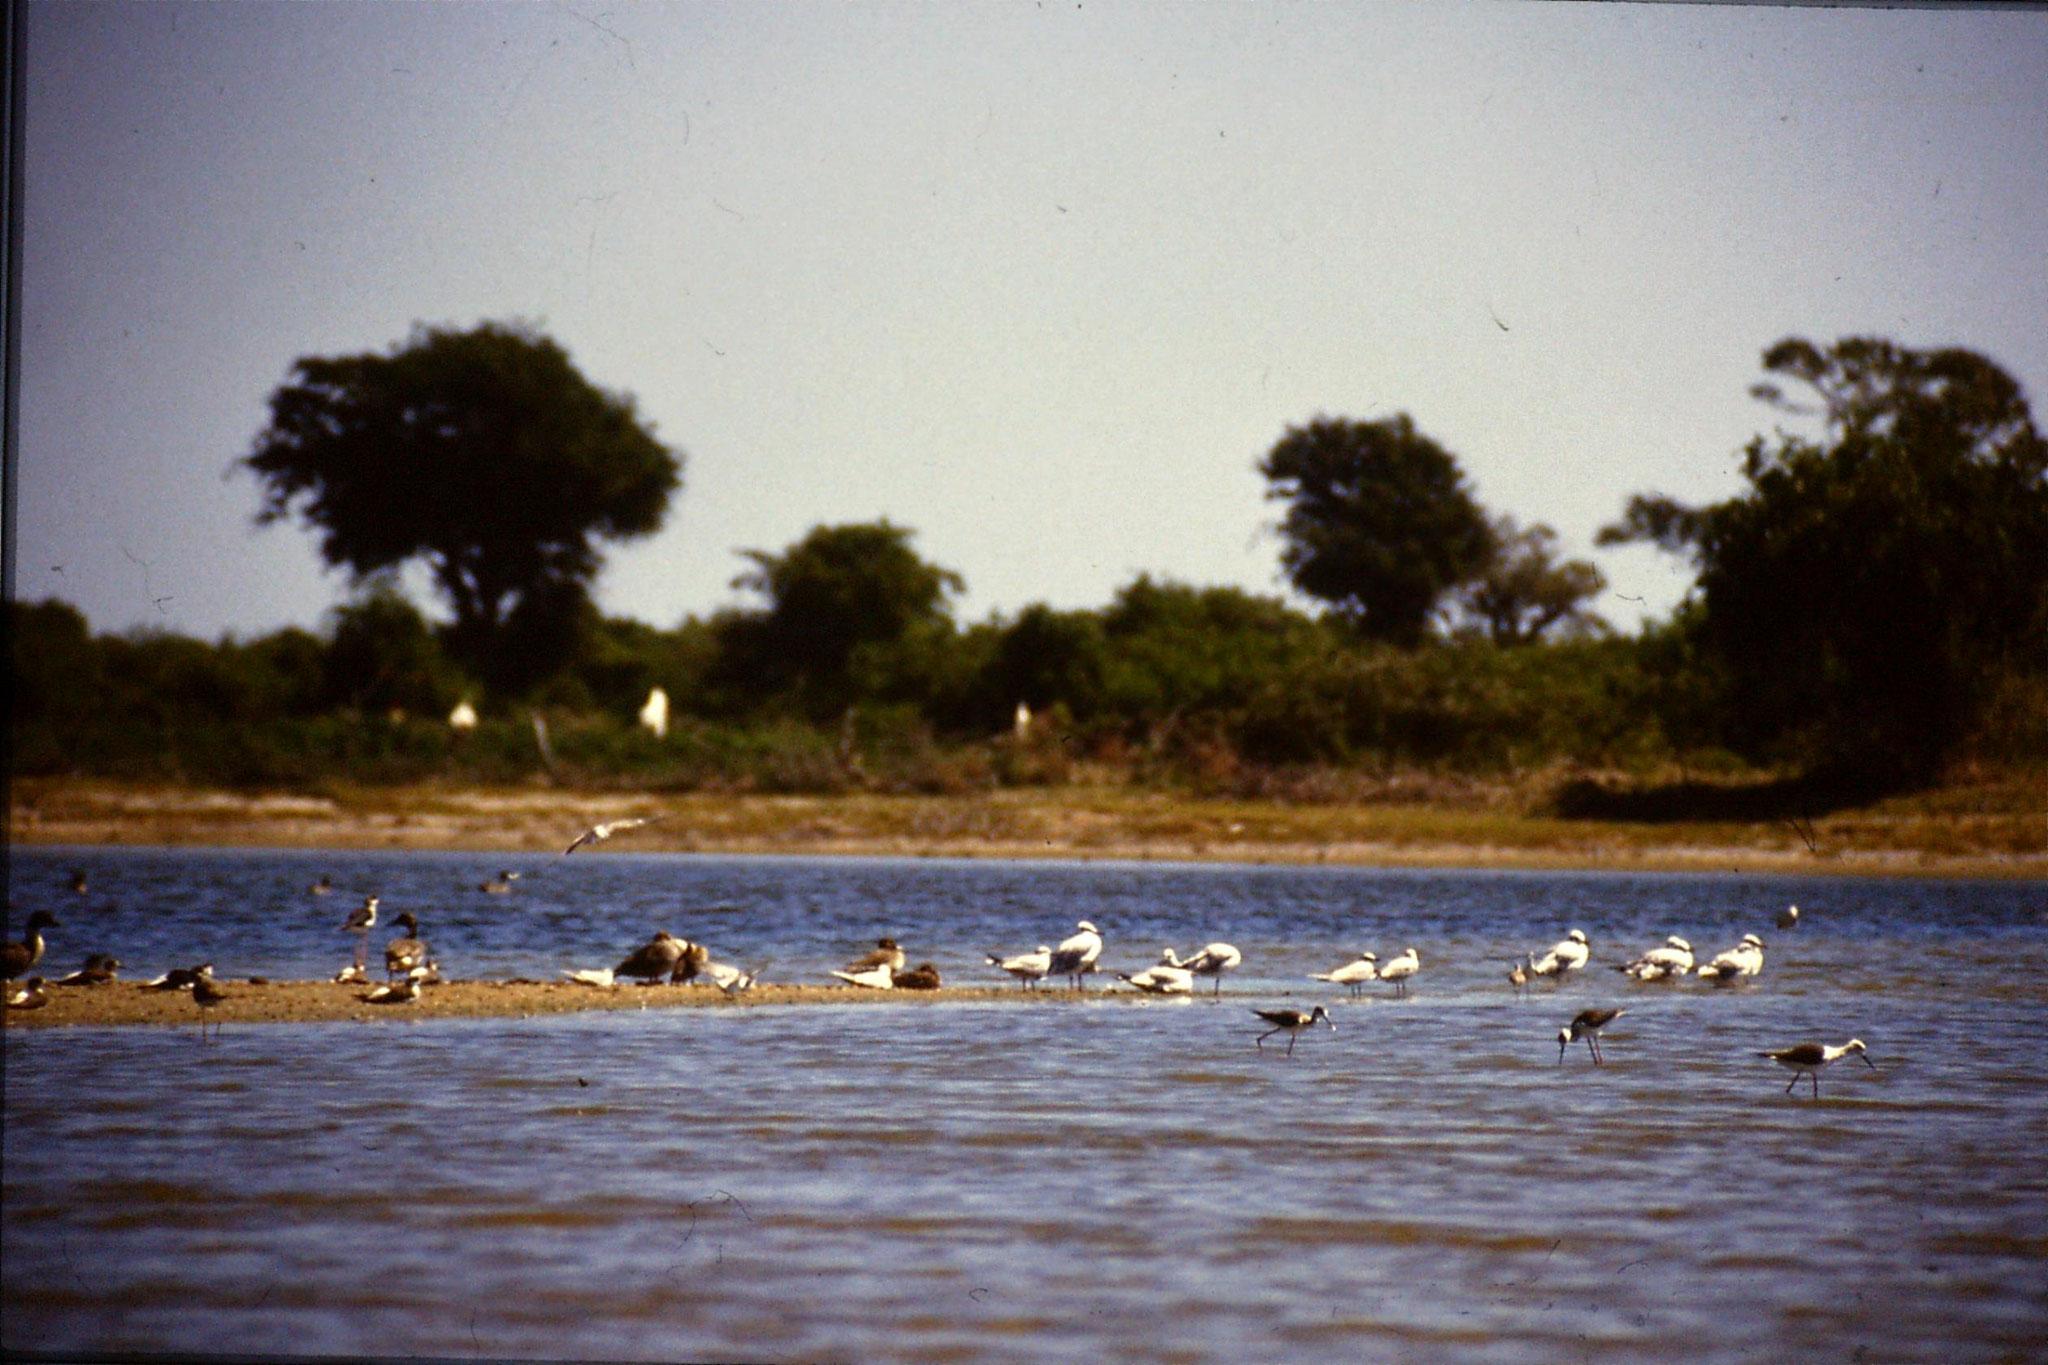 26/1/1990: 37: Kirinda lagoon